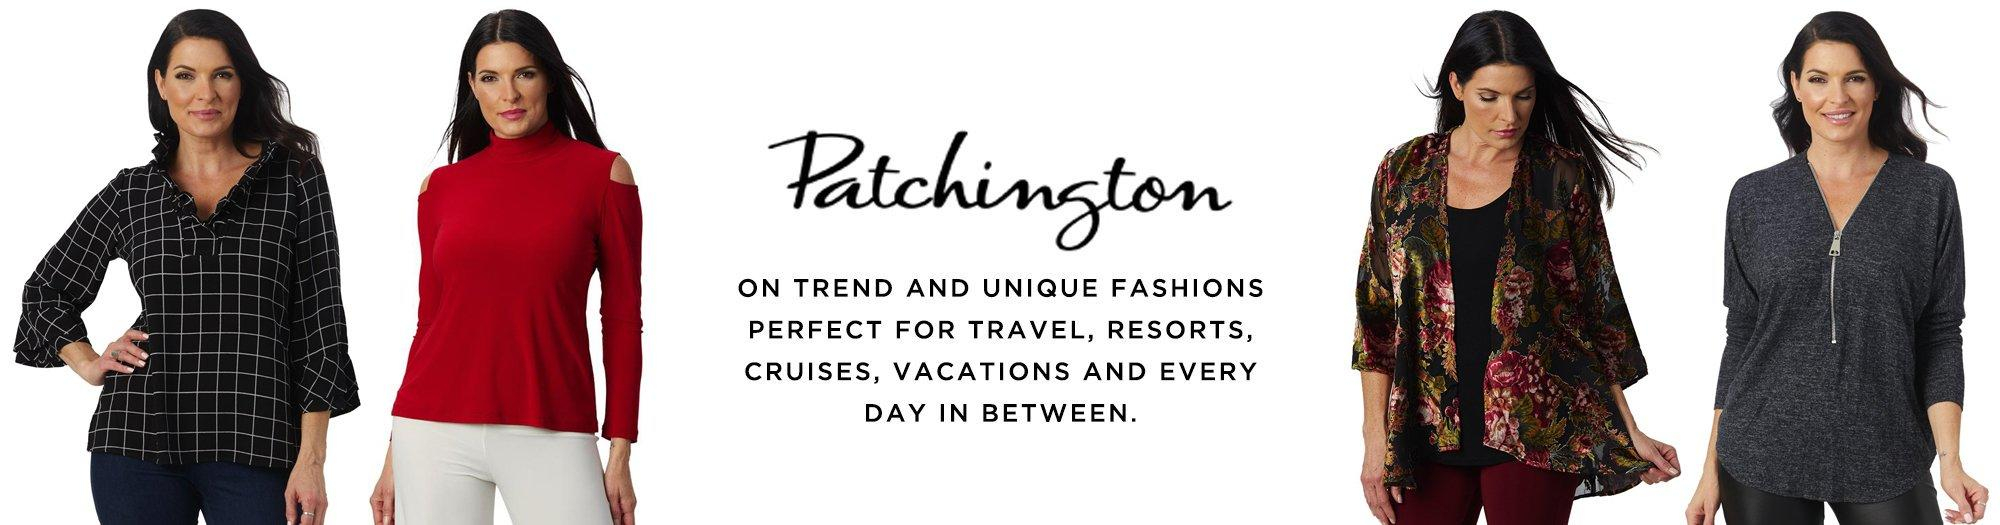 Patchington image 0